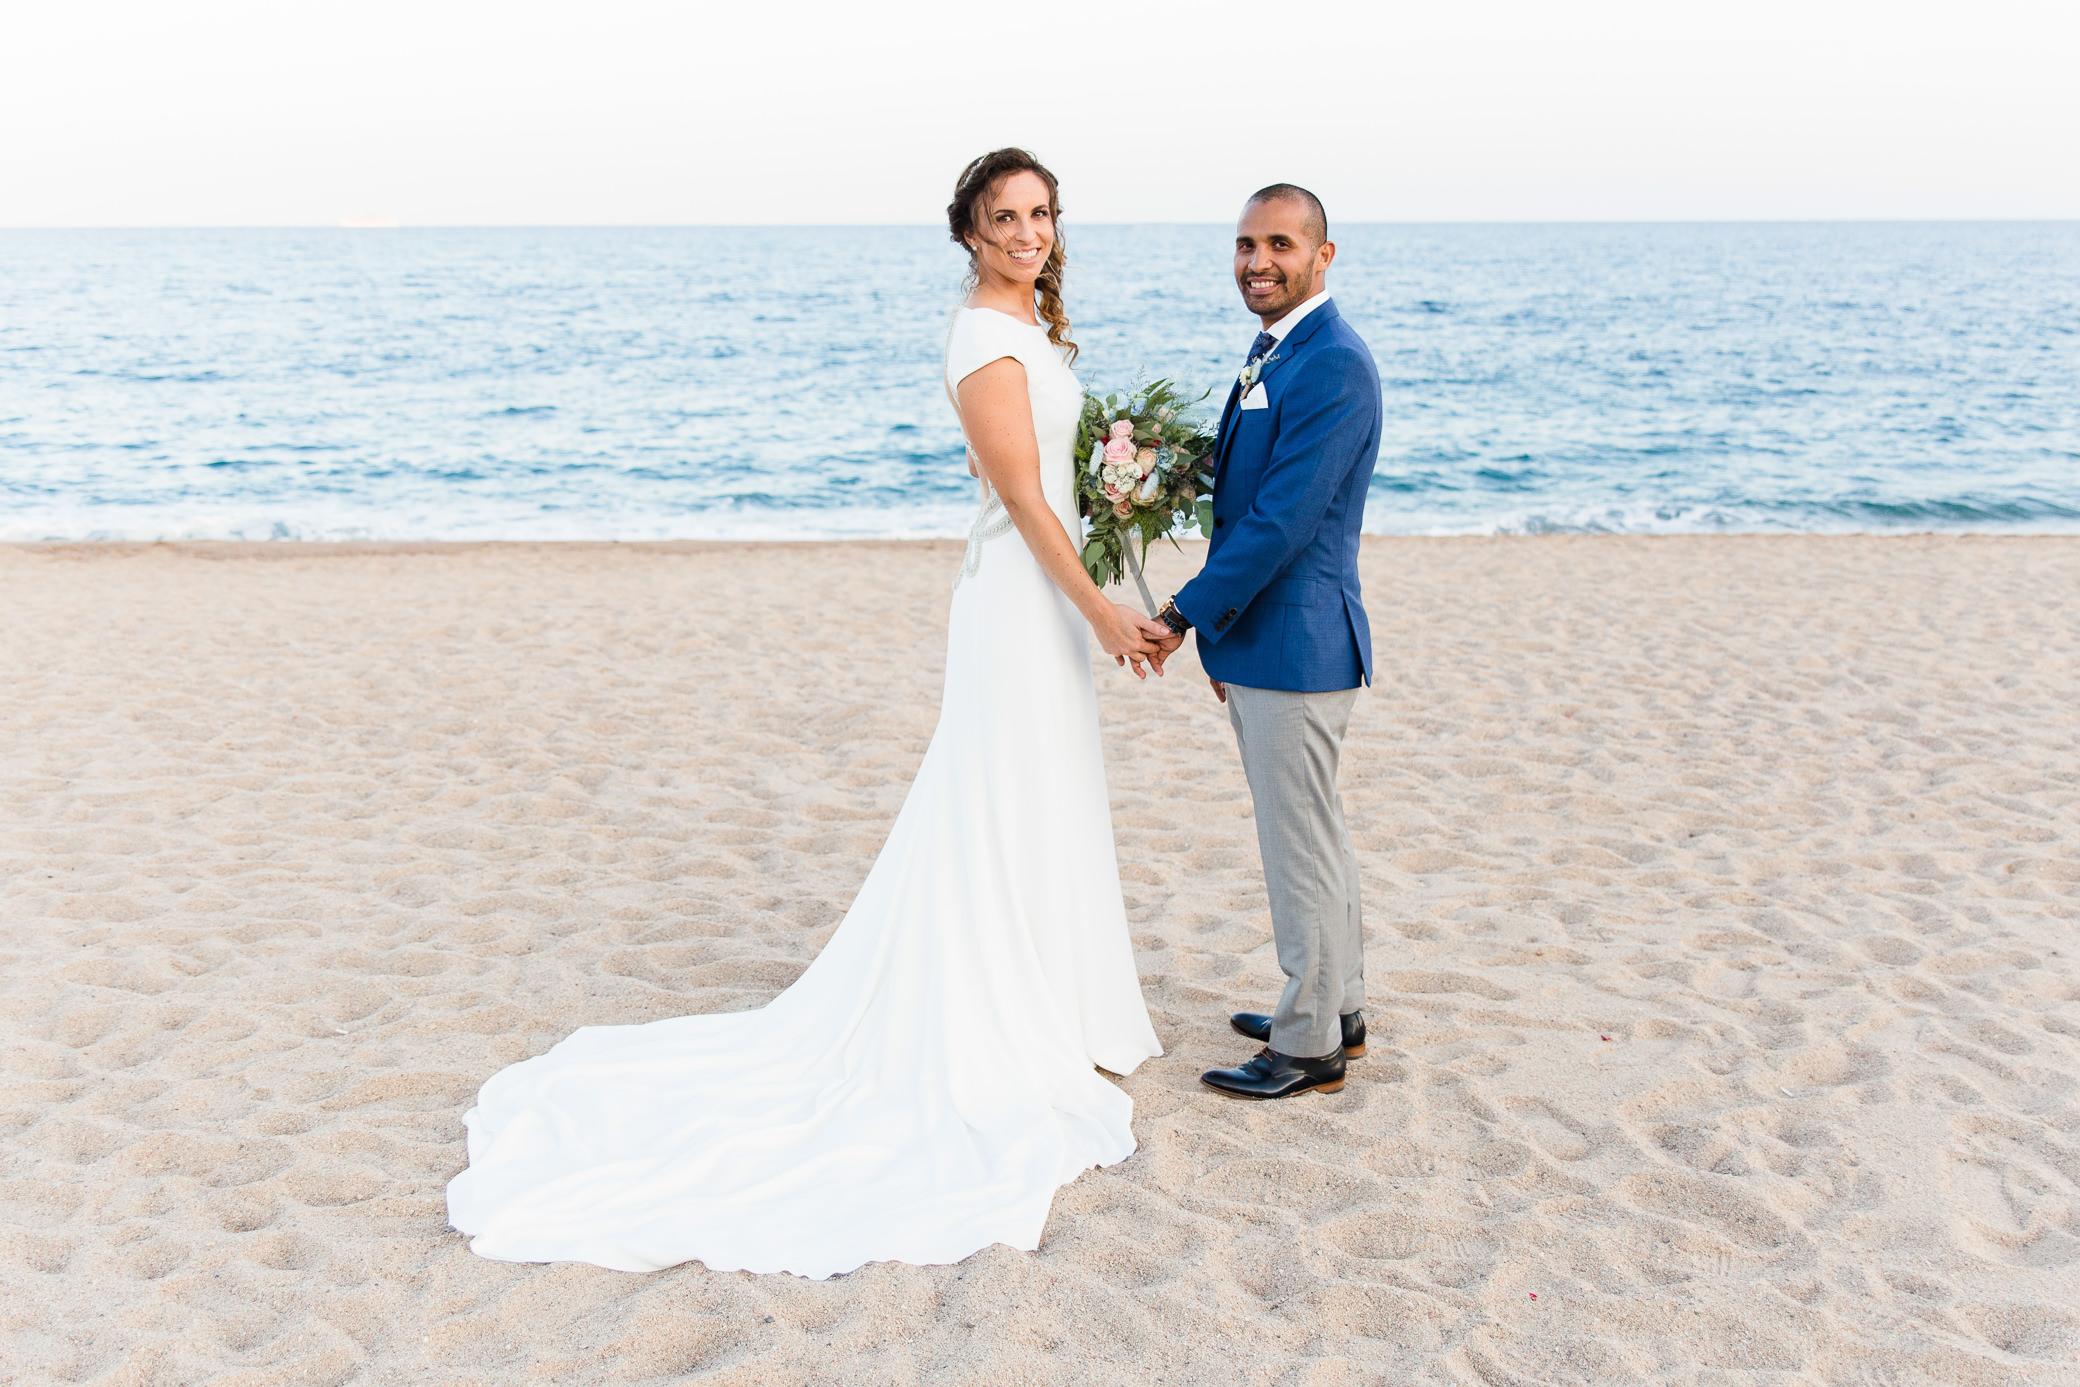 boda-en-playa-dblanc-malgrat-de-mar-photografeel-41.jpg